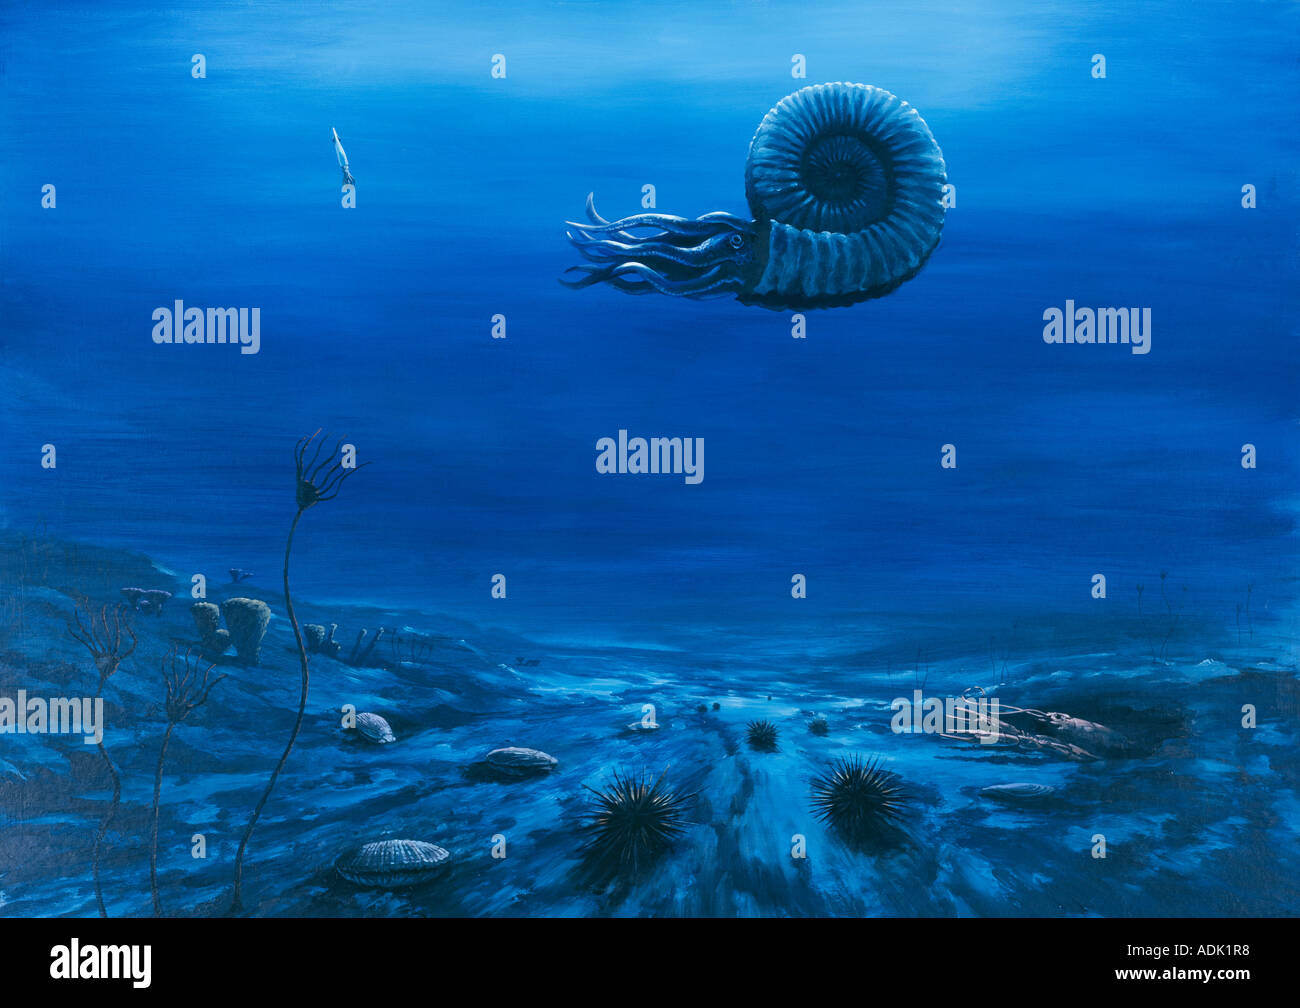 Cretaceous chalk seafloor - Stock Image